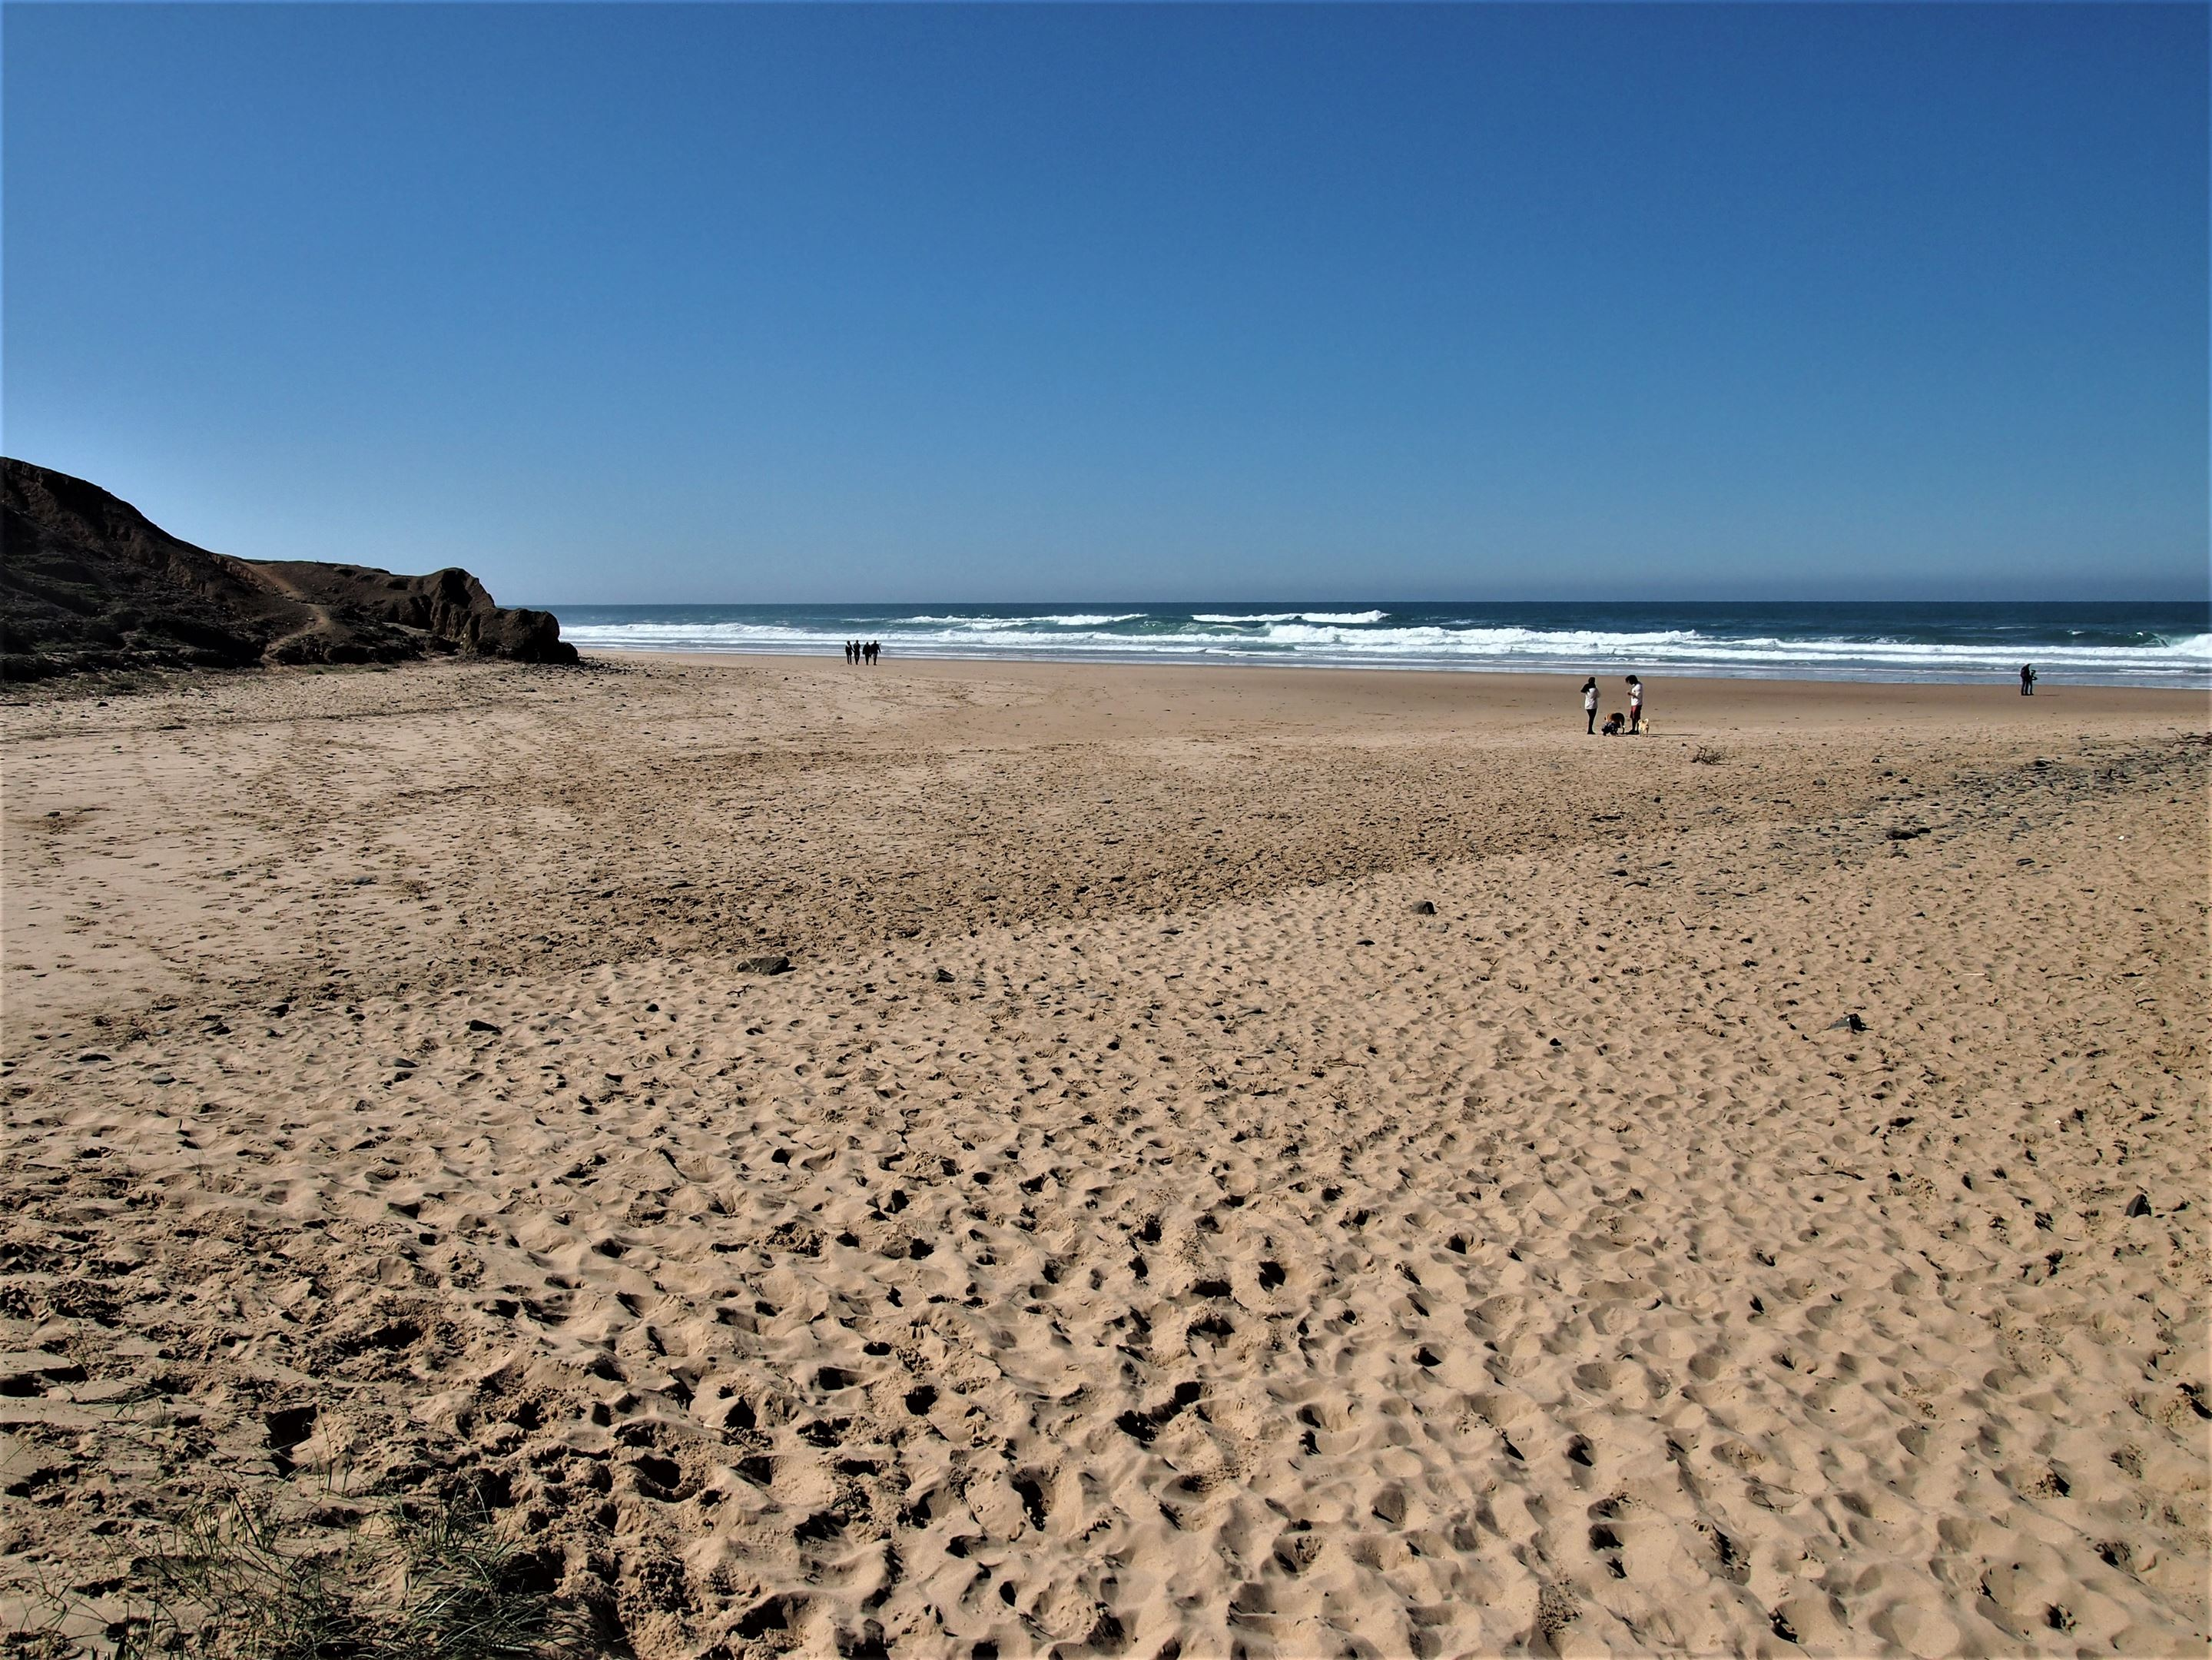 Praia da Cordoama, Algarve